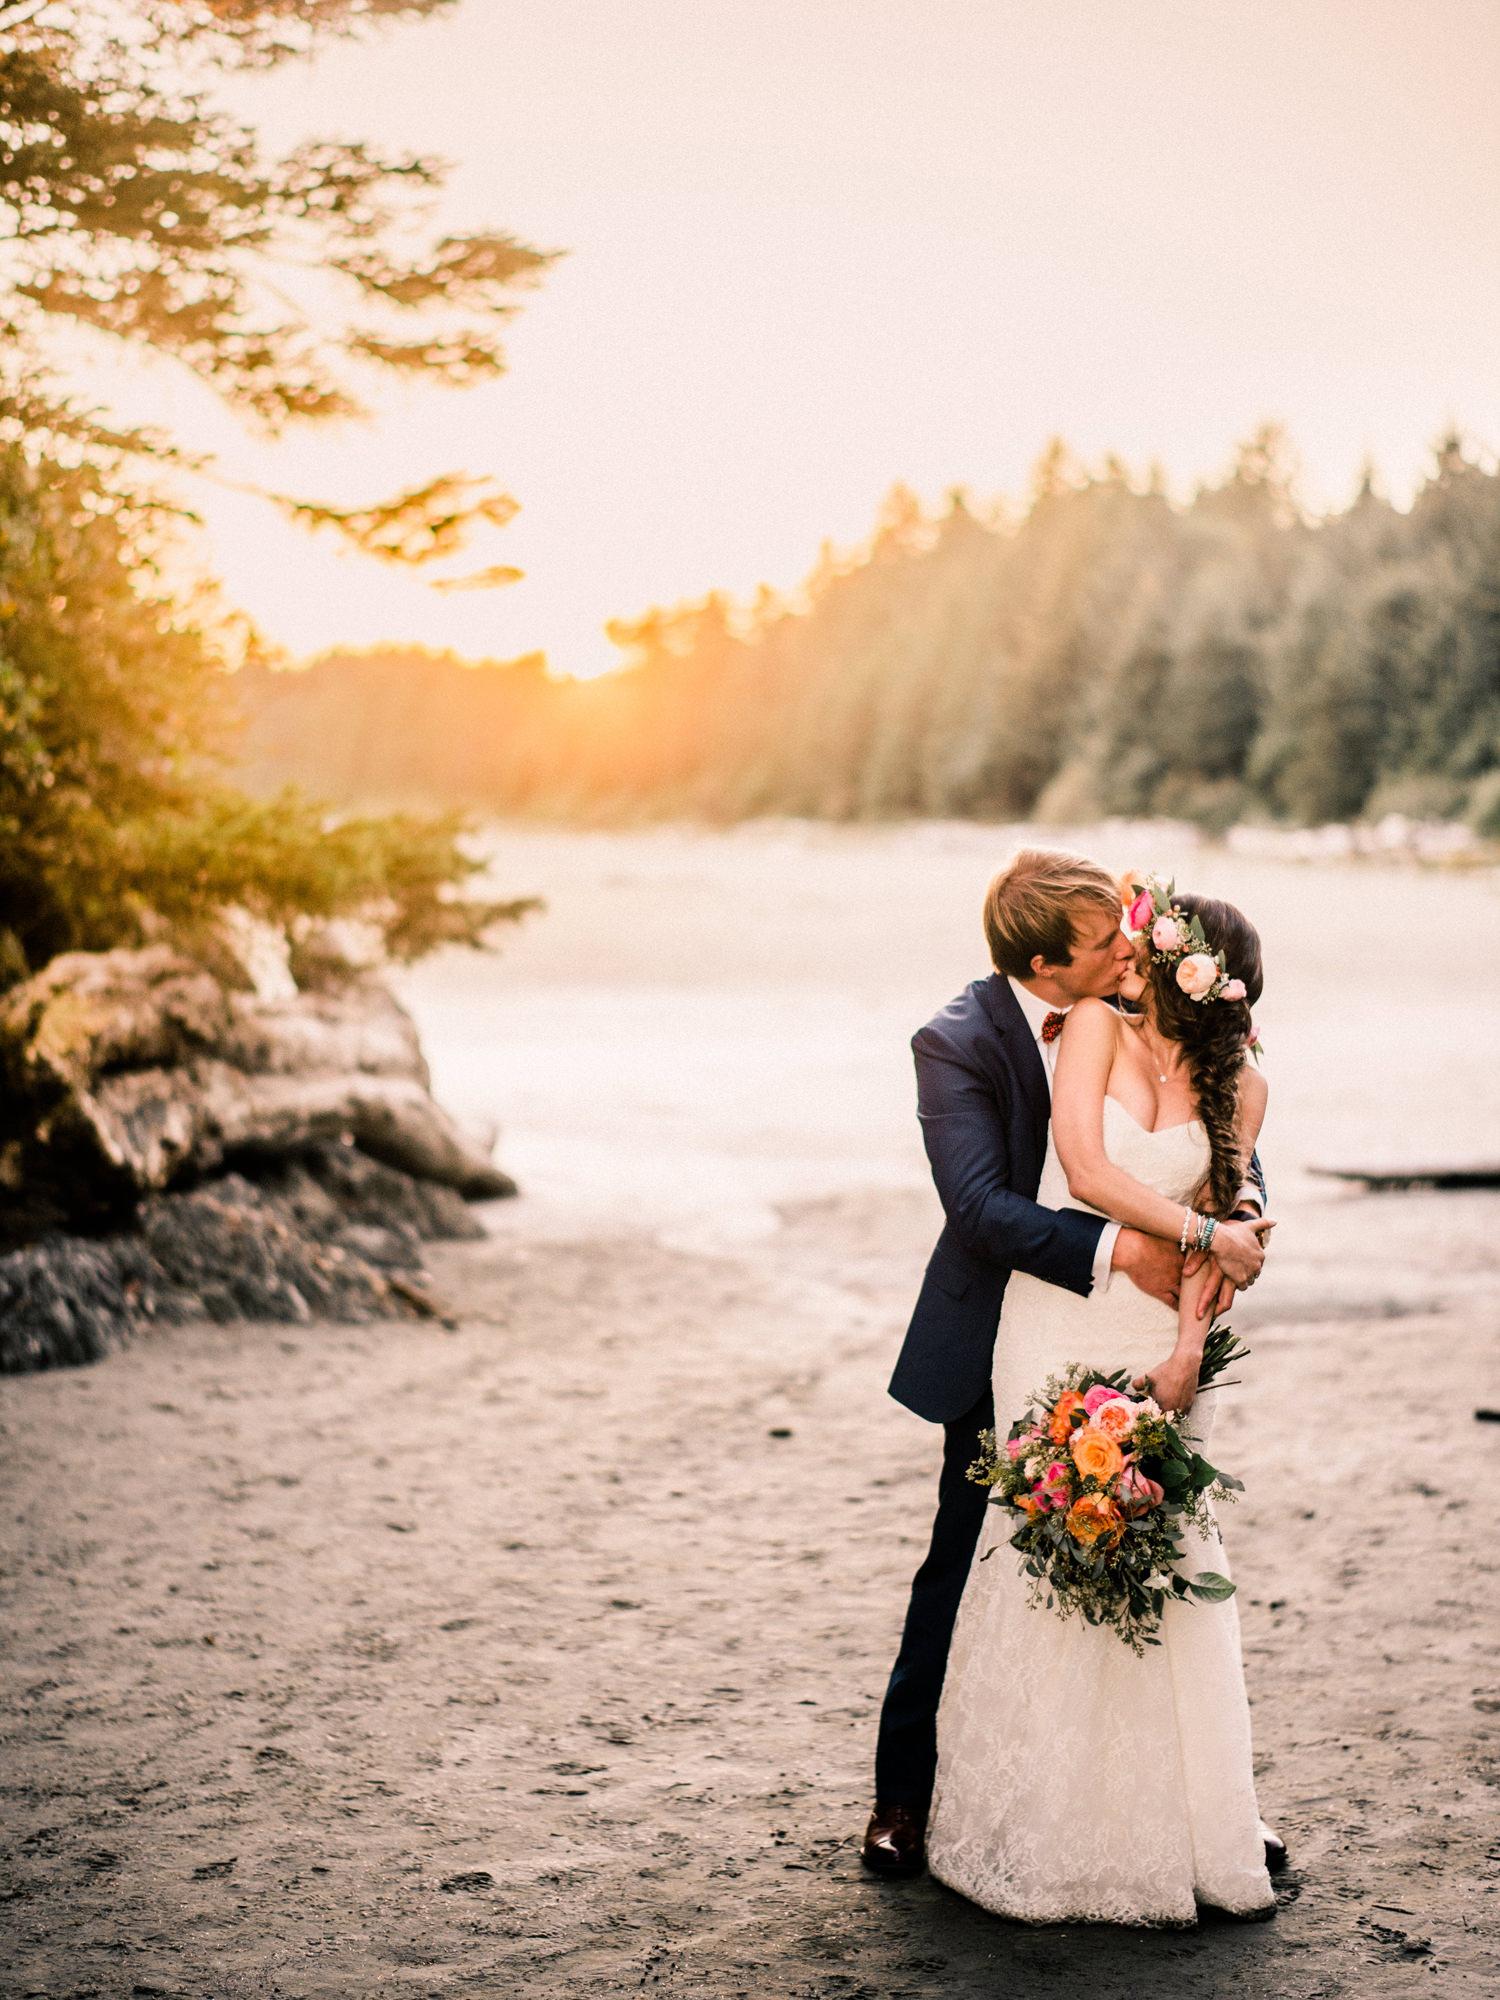 wickaninnish-inn-tofino-bc-elopement-ryan-flynn-photography-00080.JPG